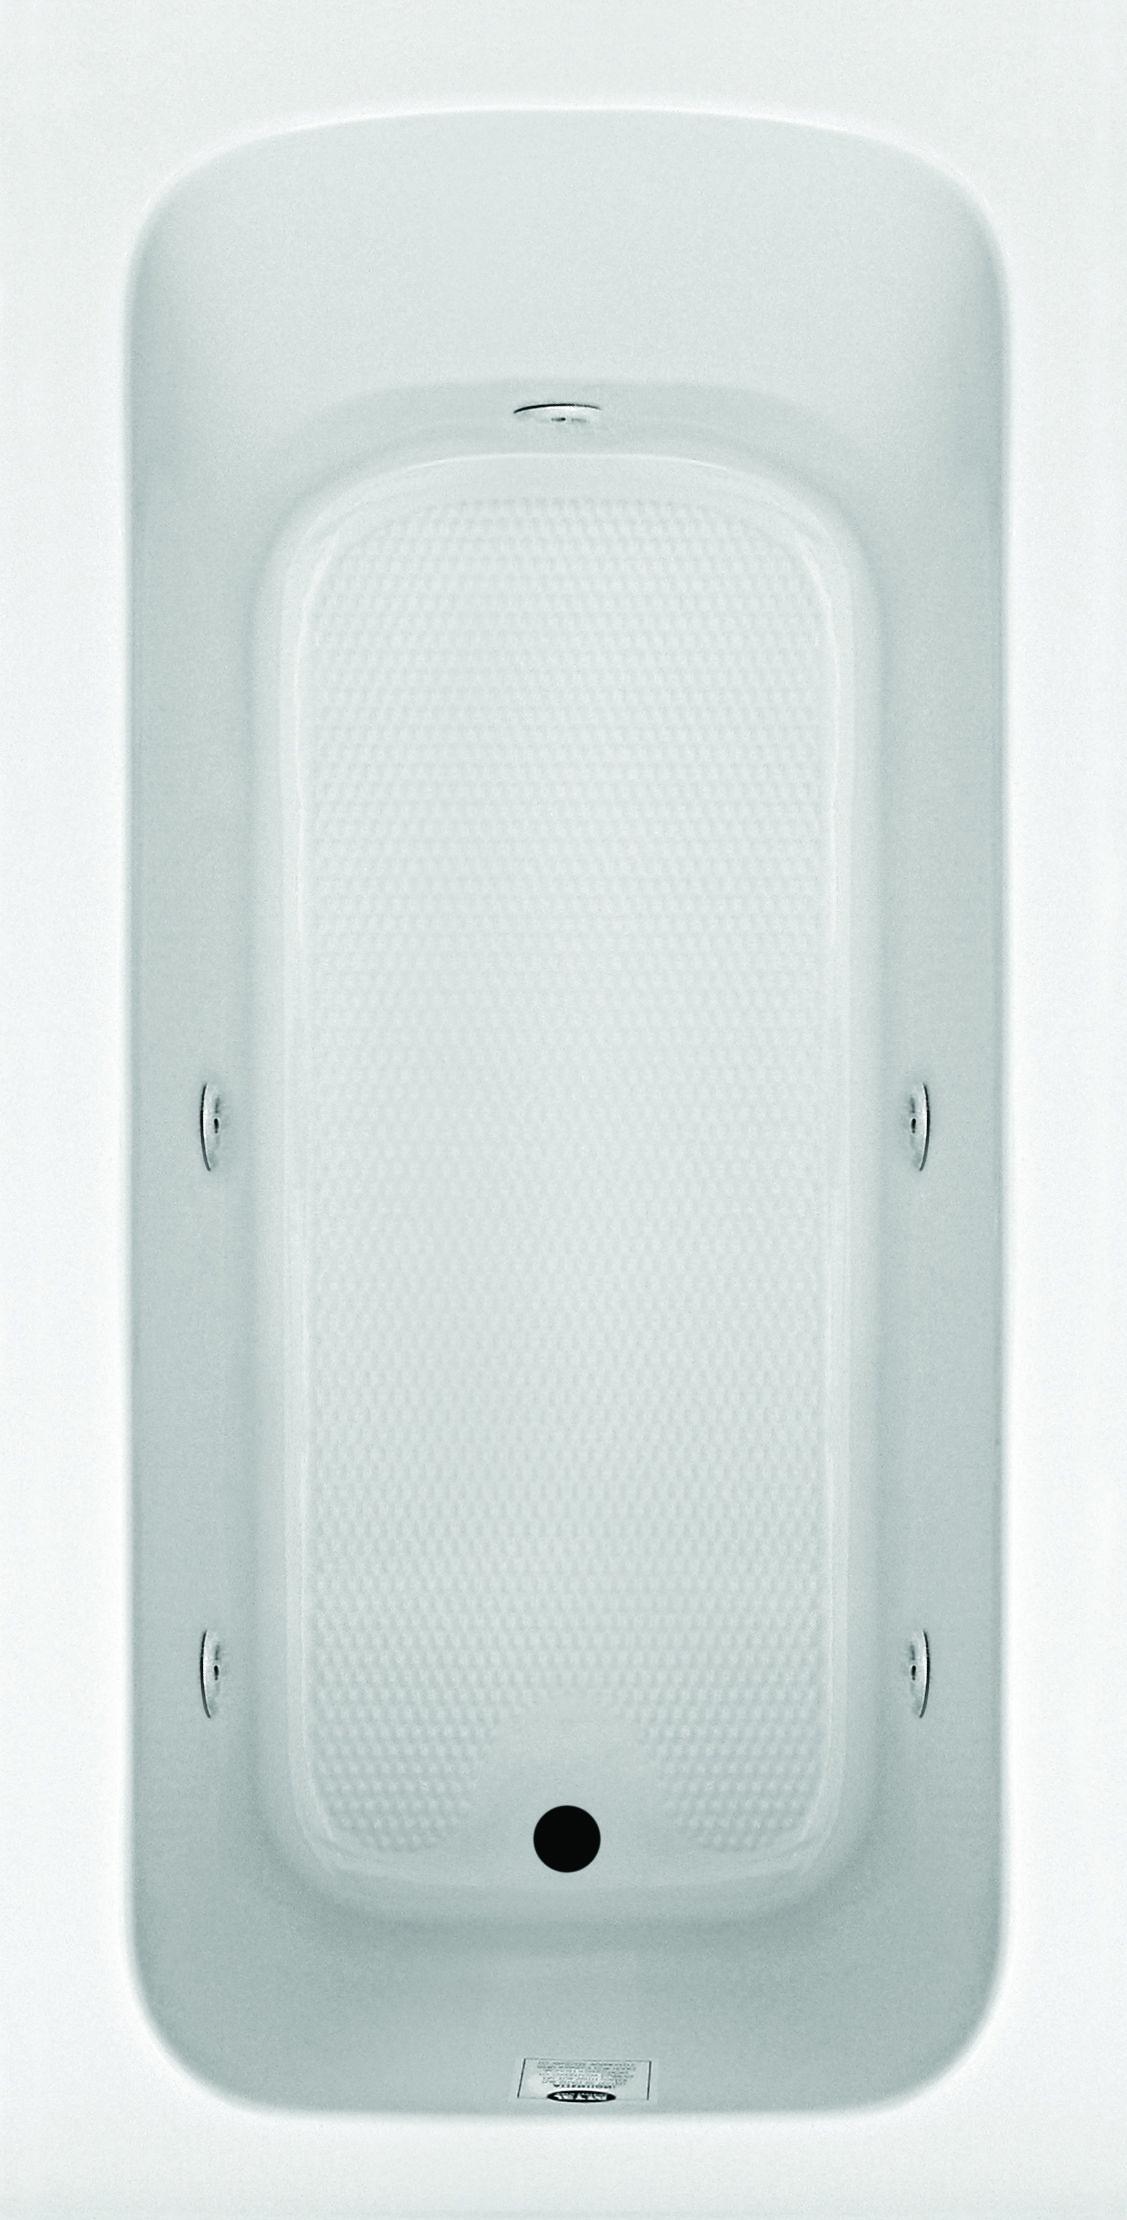 Jetta Advantage whirlpool bathtub, E13S Riser model. Visit www ...